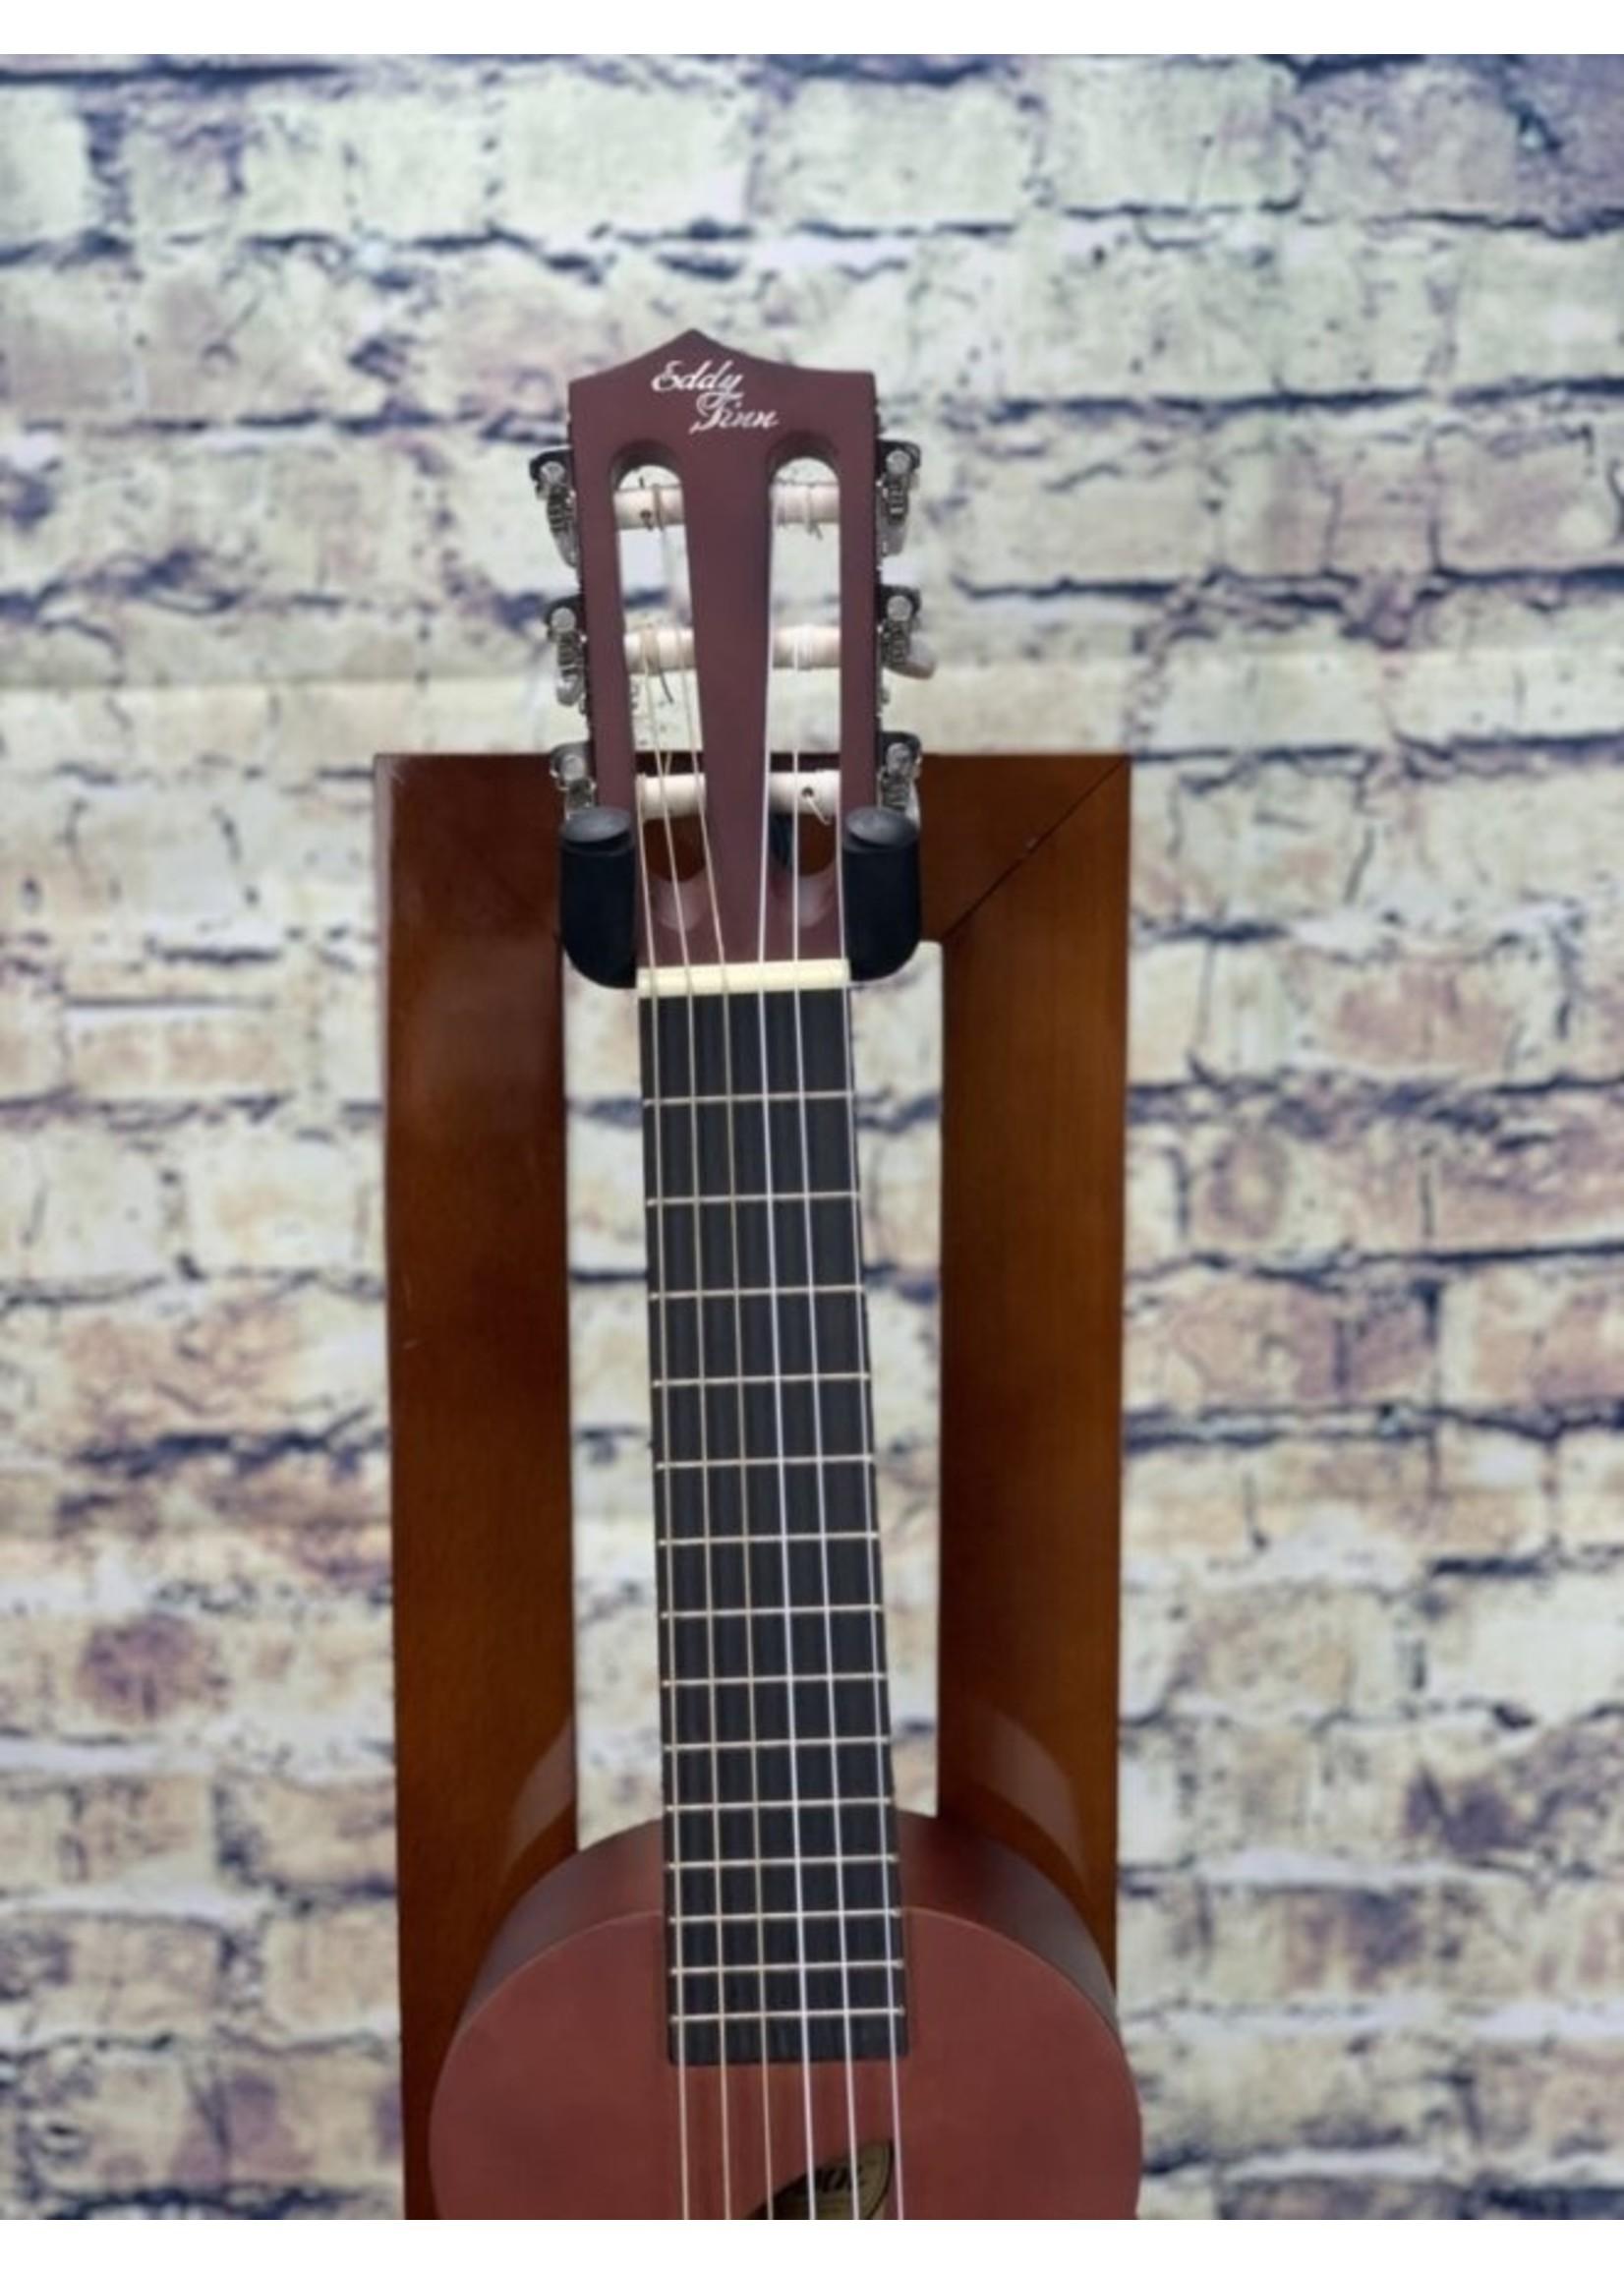 Eddy Finn Eddy Finn  EF-G6 Guitar LELE  Bass Wood  Tenor Natural